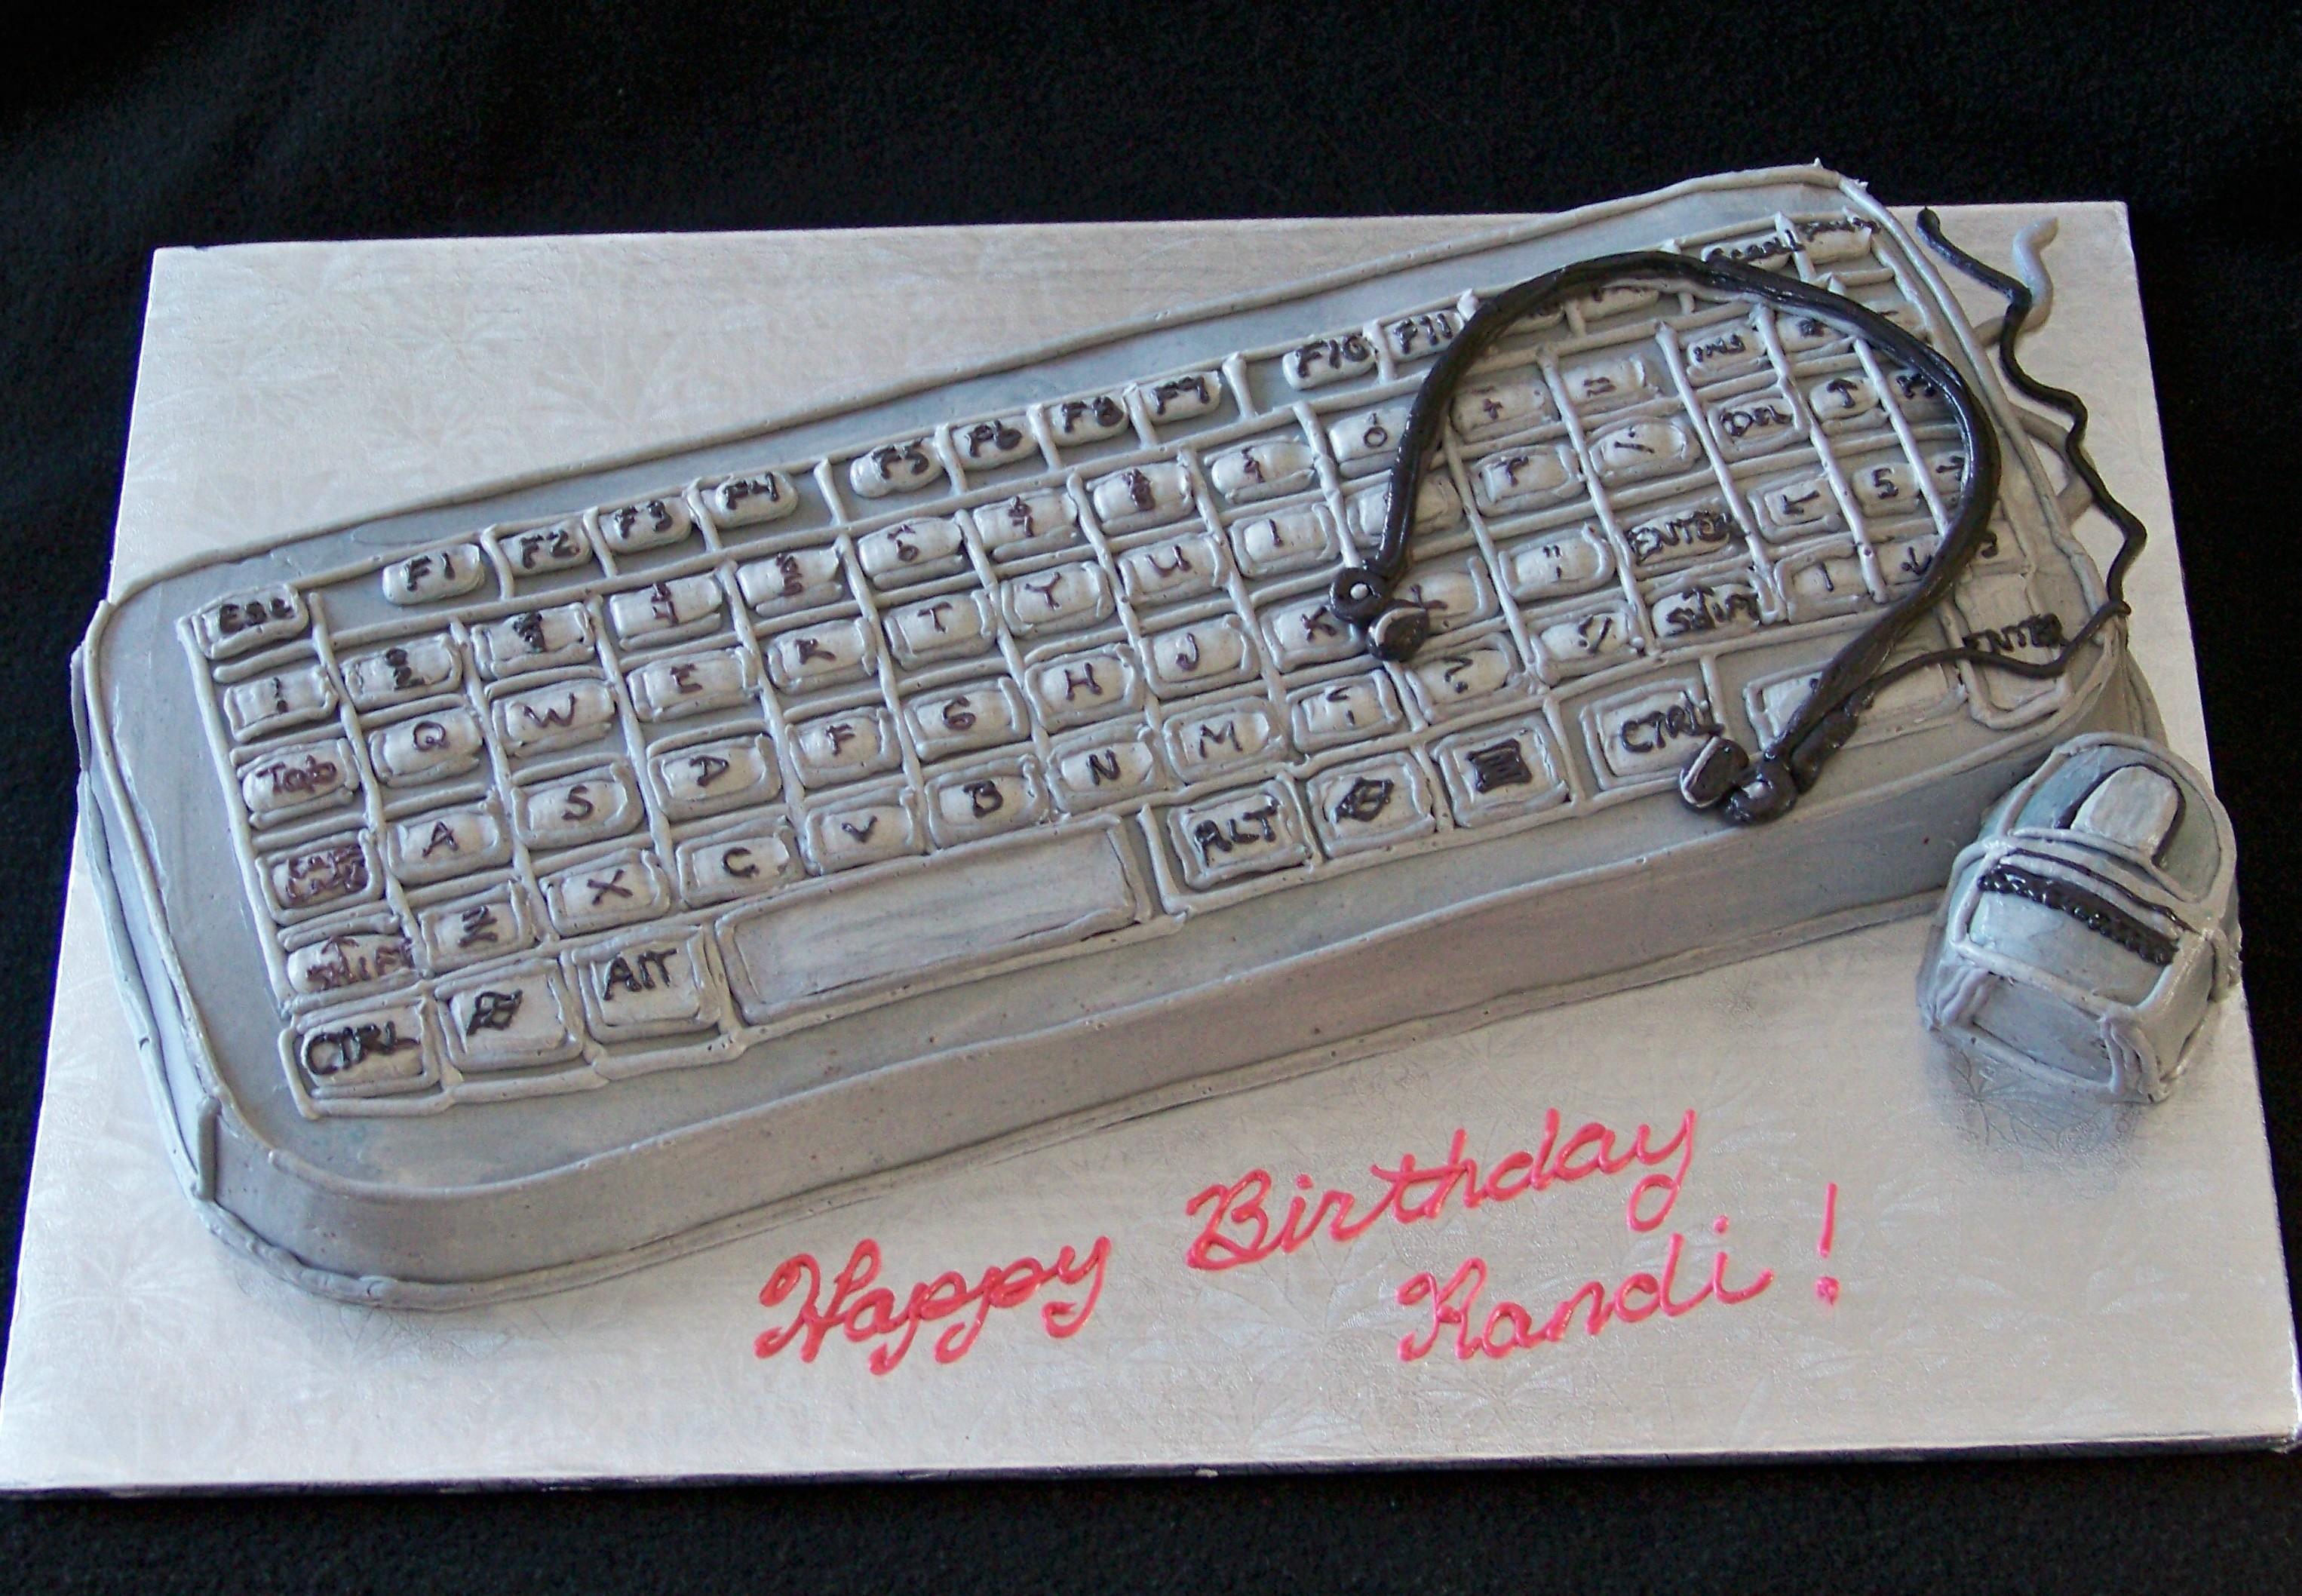 3D Computer Keyboard Cake